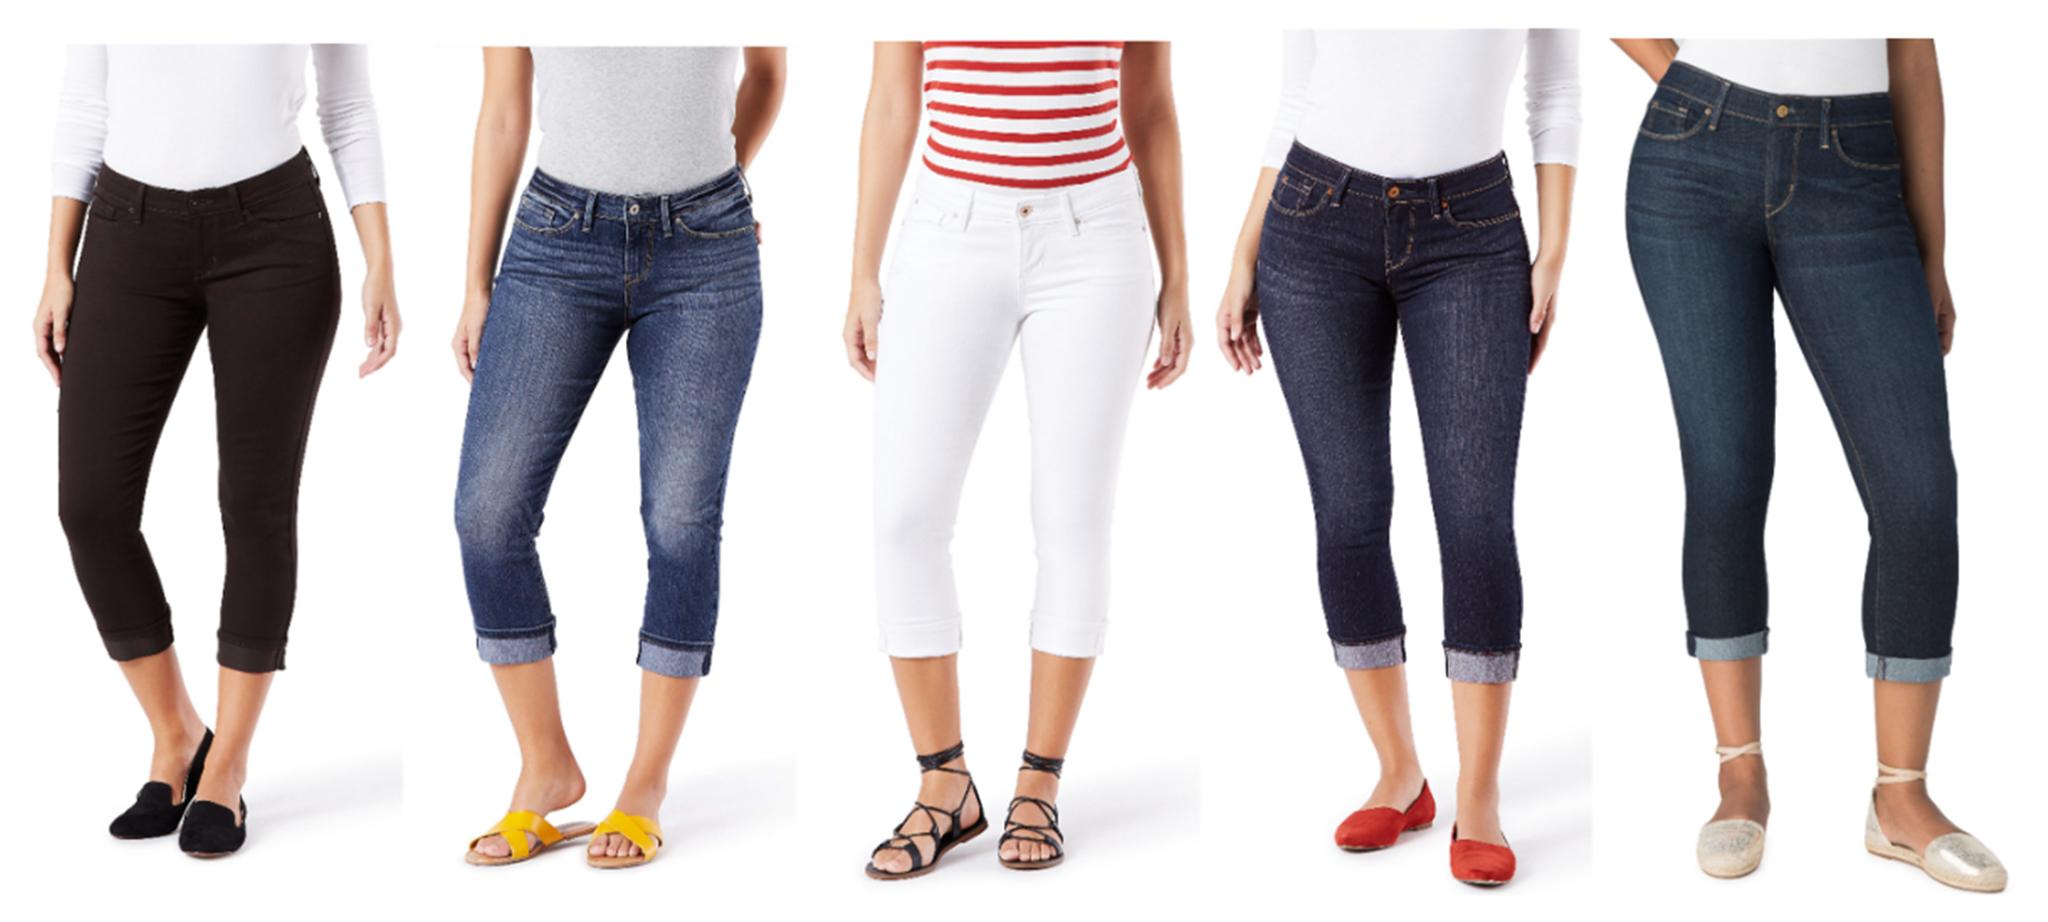 Walmart – Signature by Levi Strauss & Co. Women's Modern Capri Only $8.99, Reg $19.76!